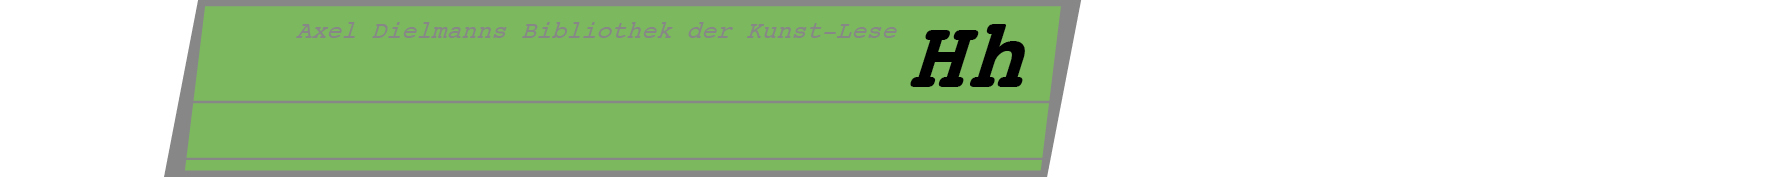 Kartei-H